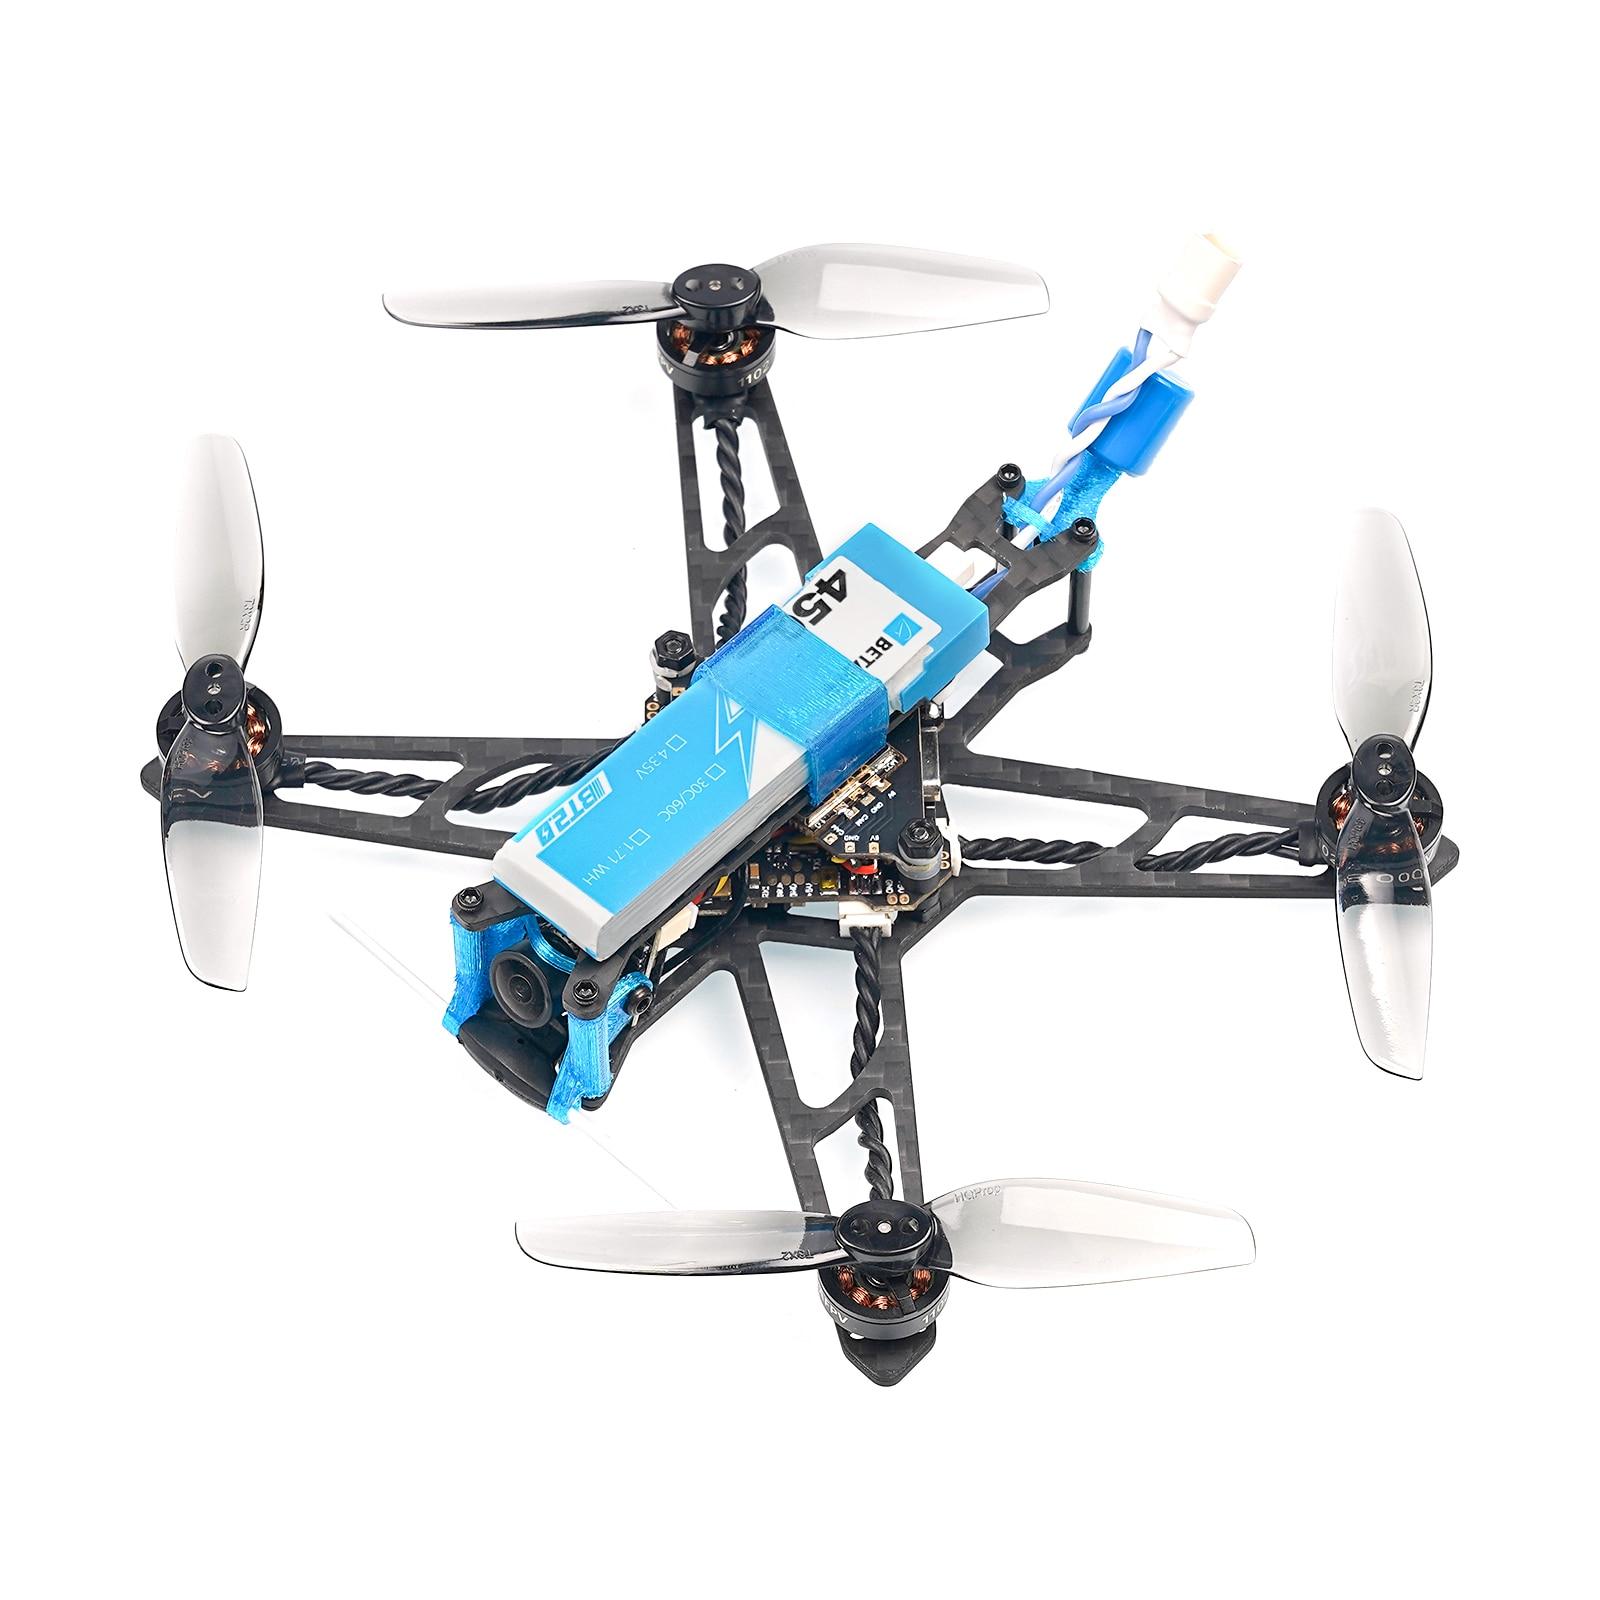 BETAFPV HX115 LR Toothpick Drone F4 1S 12A AIO FC with ELRS 2.4G Receiver 1102-18000KV Motor HX115 LR Toothpick Drone